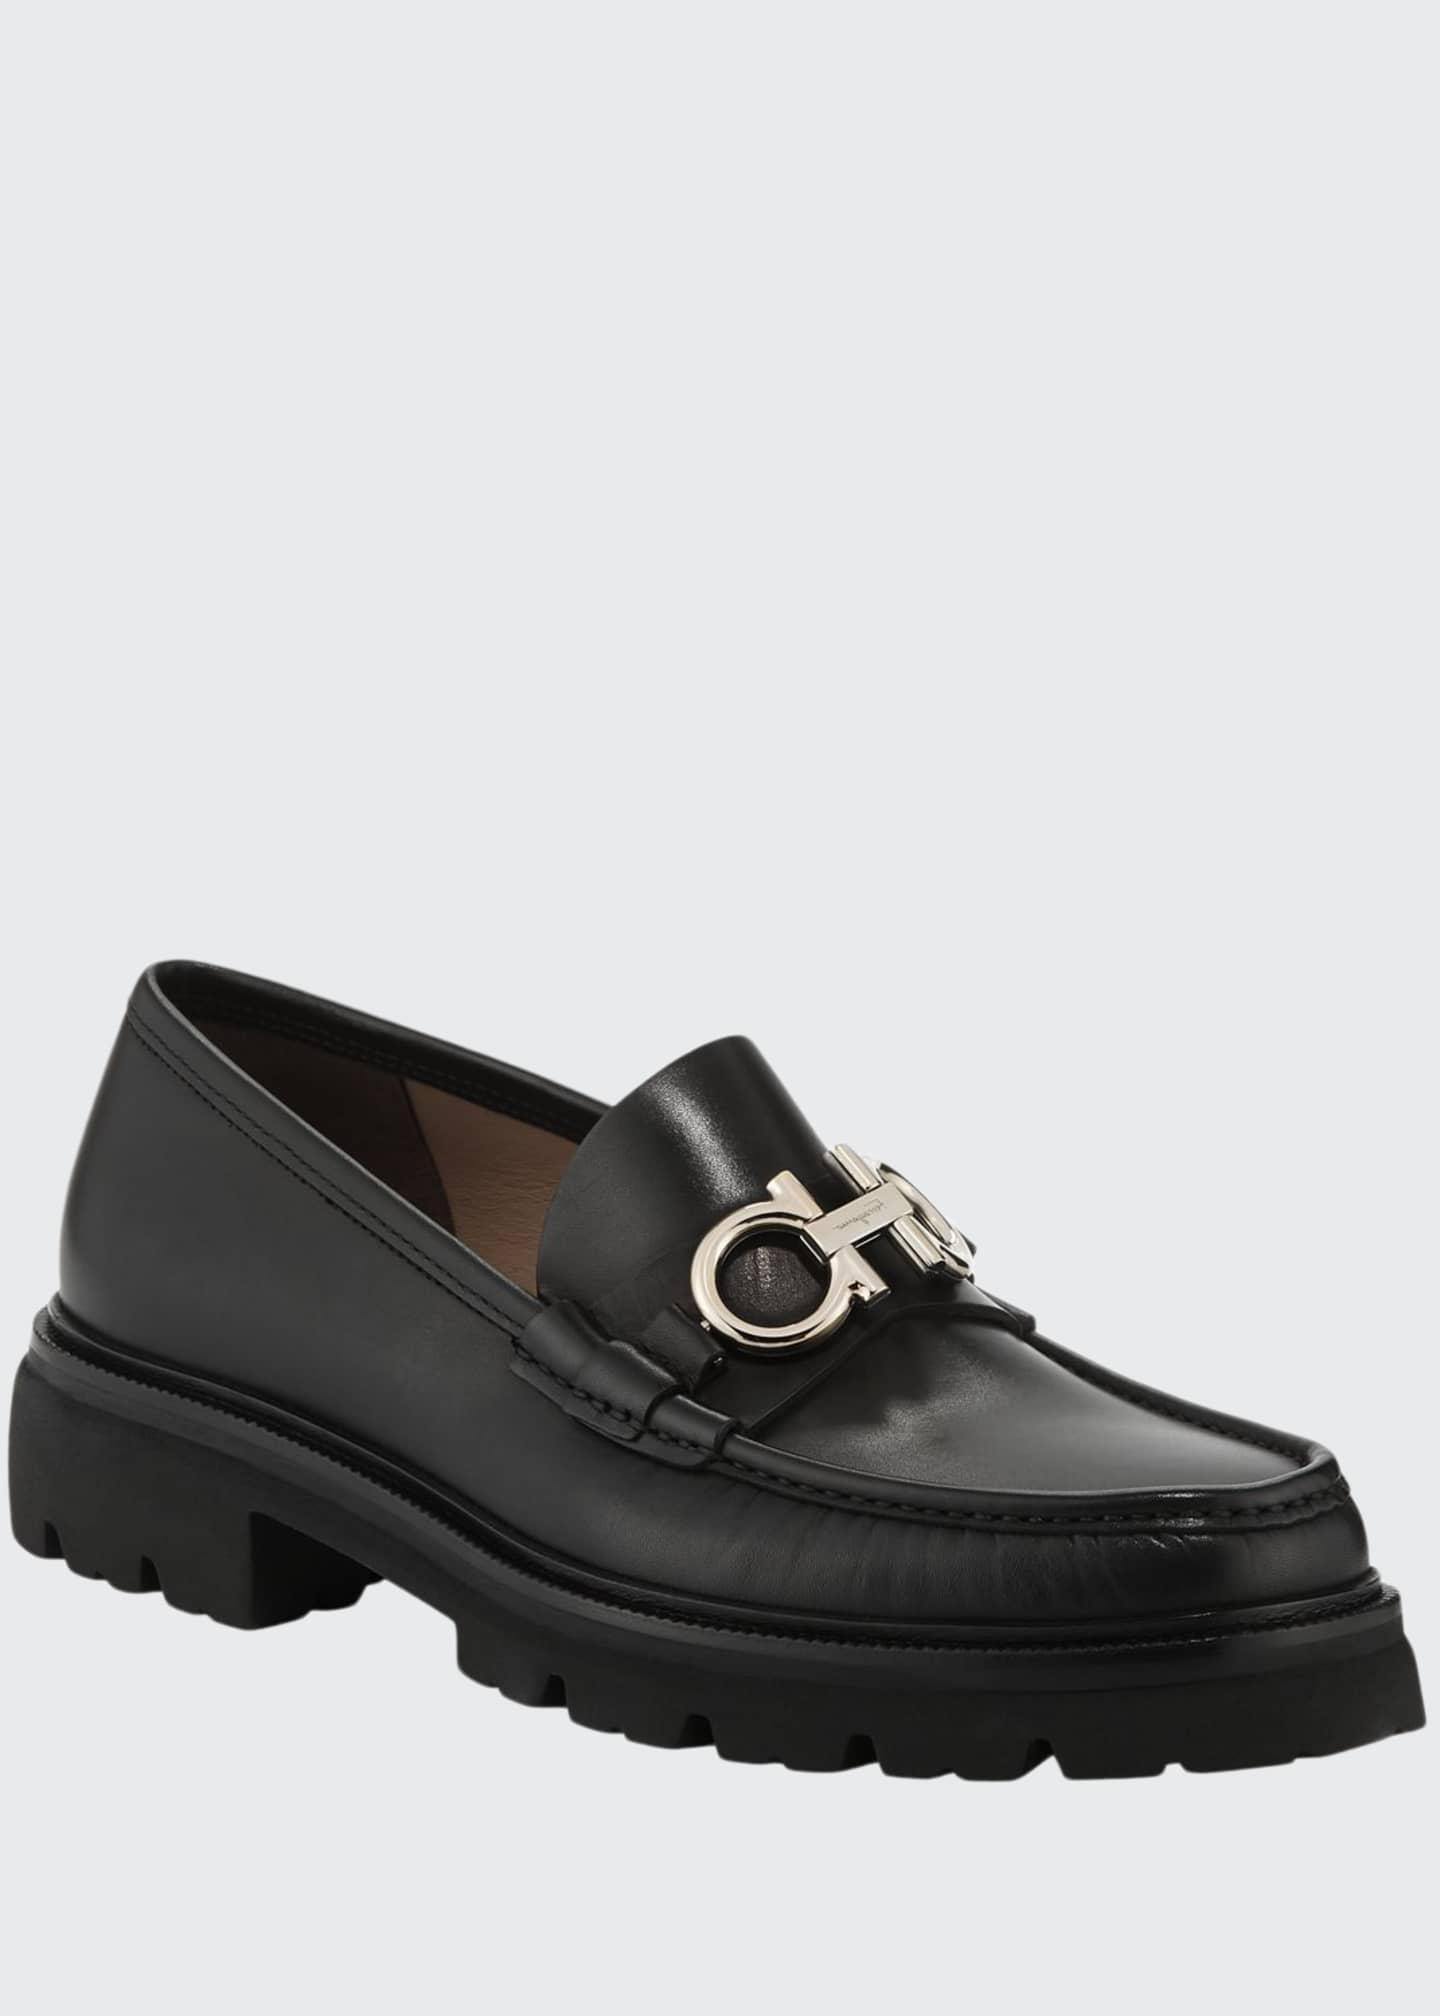 Salvatore Ferragamo Men's Bleecker Leather Lug-Sole Loafers with